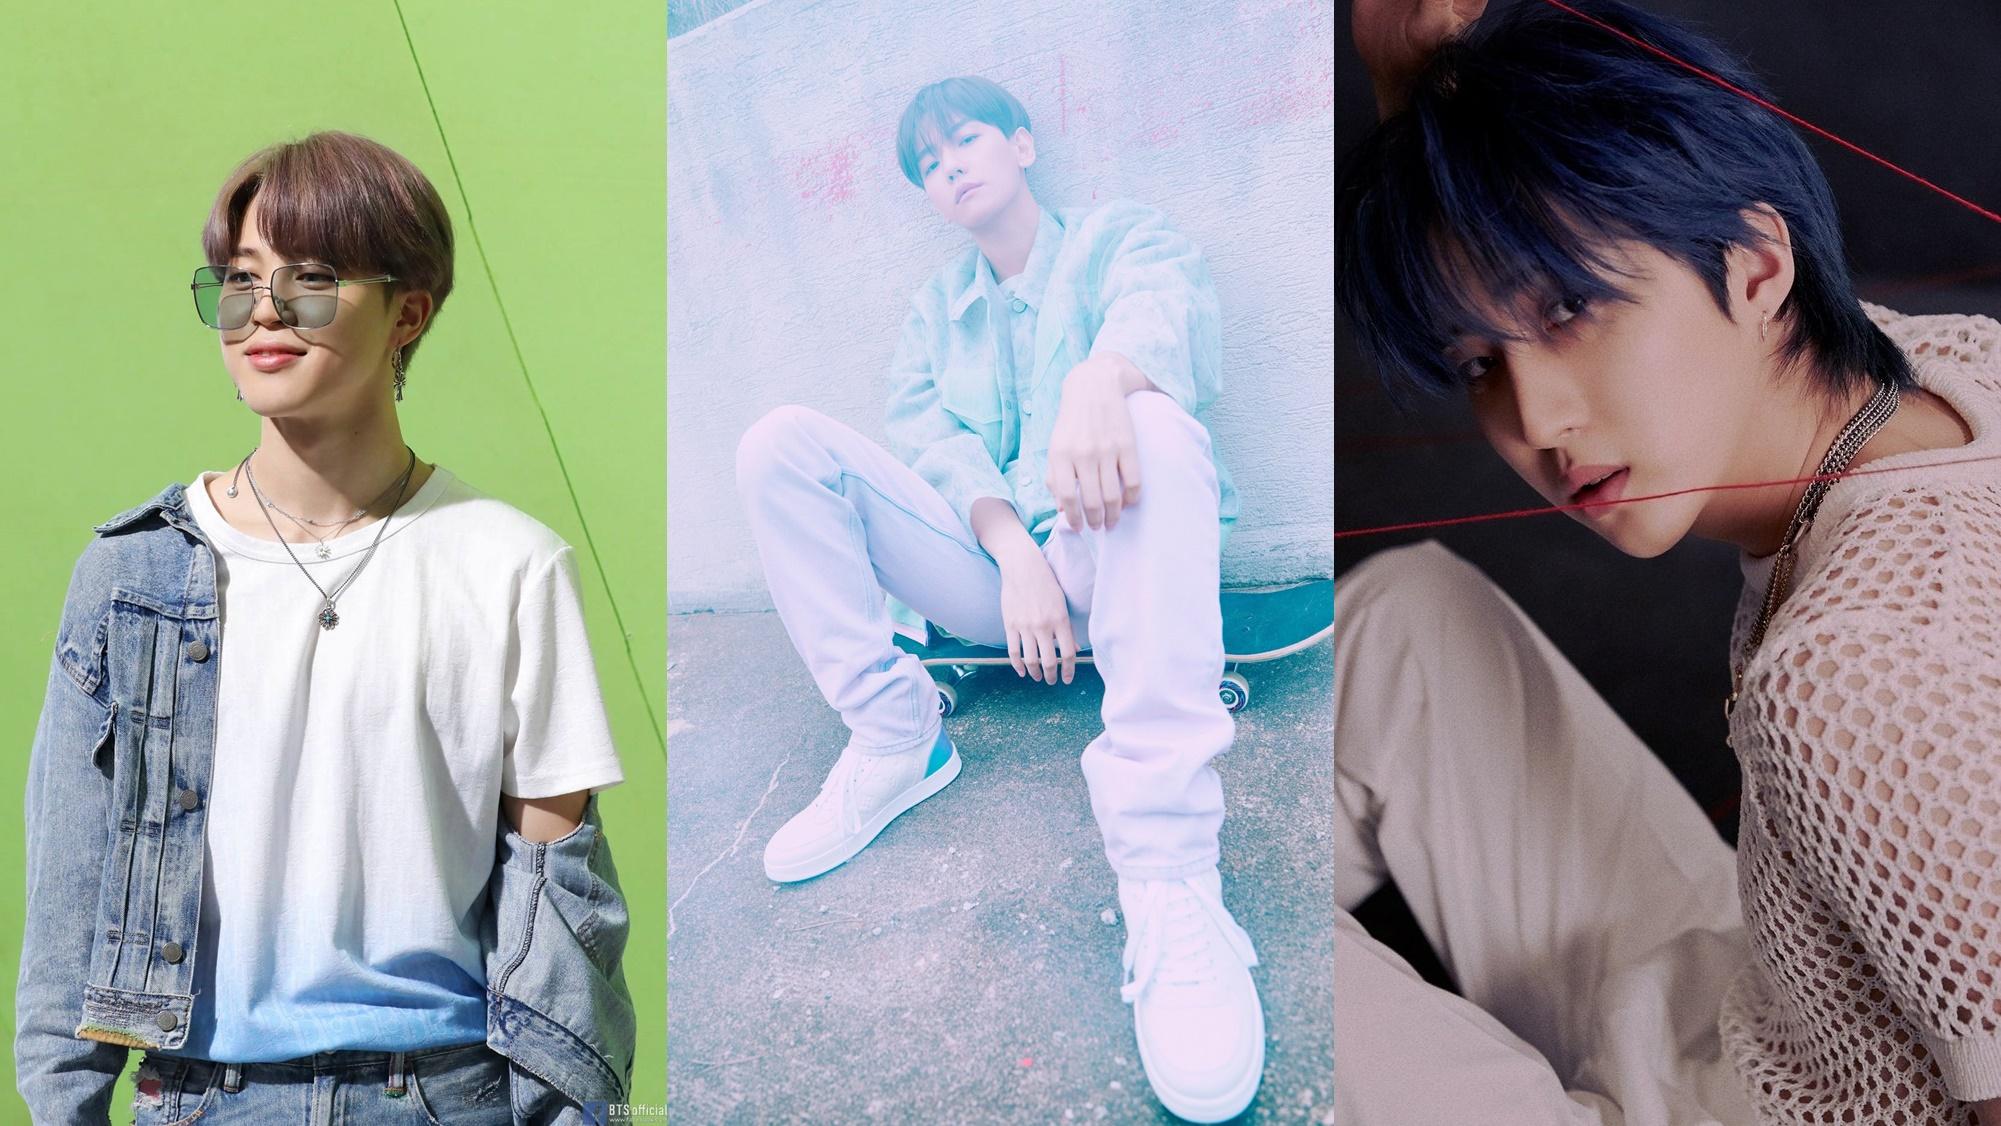 List of Brand Reputation of K-Pop Boy Group Members' in October 2020